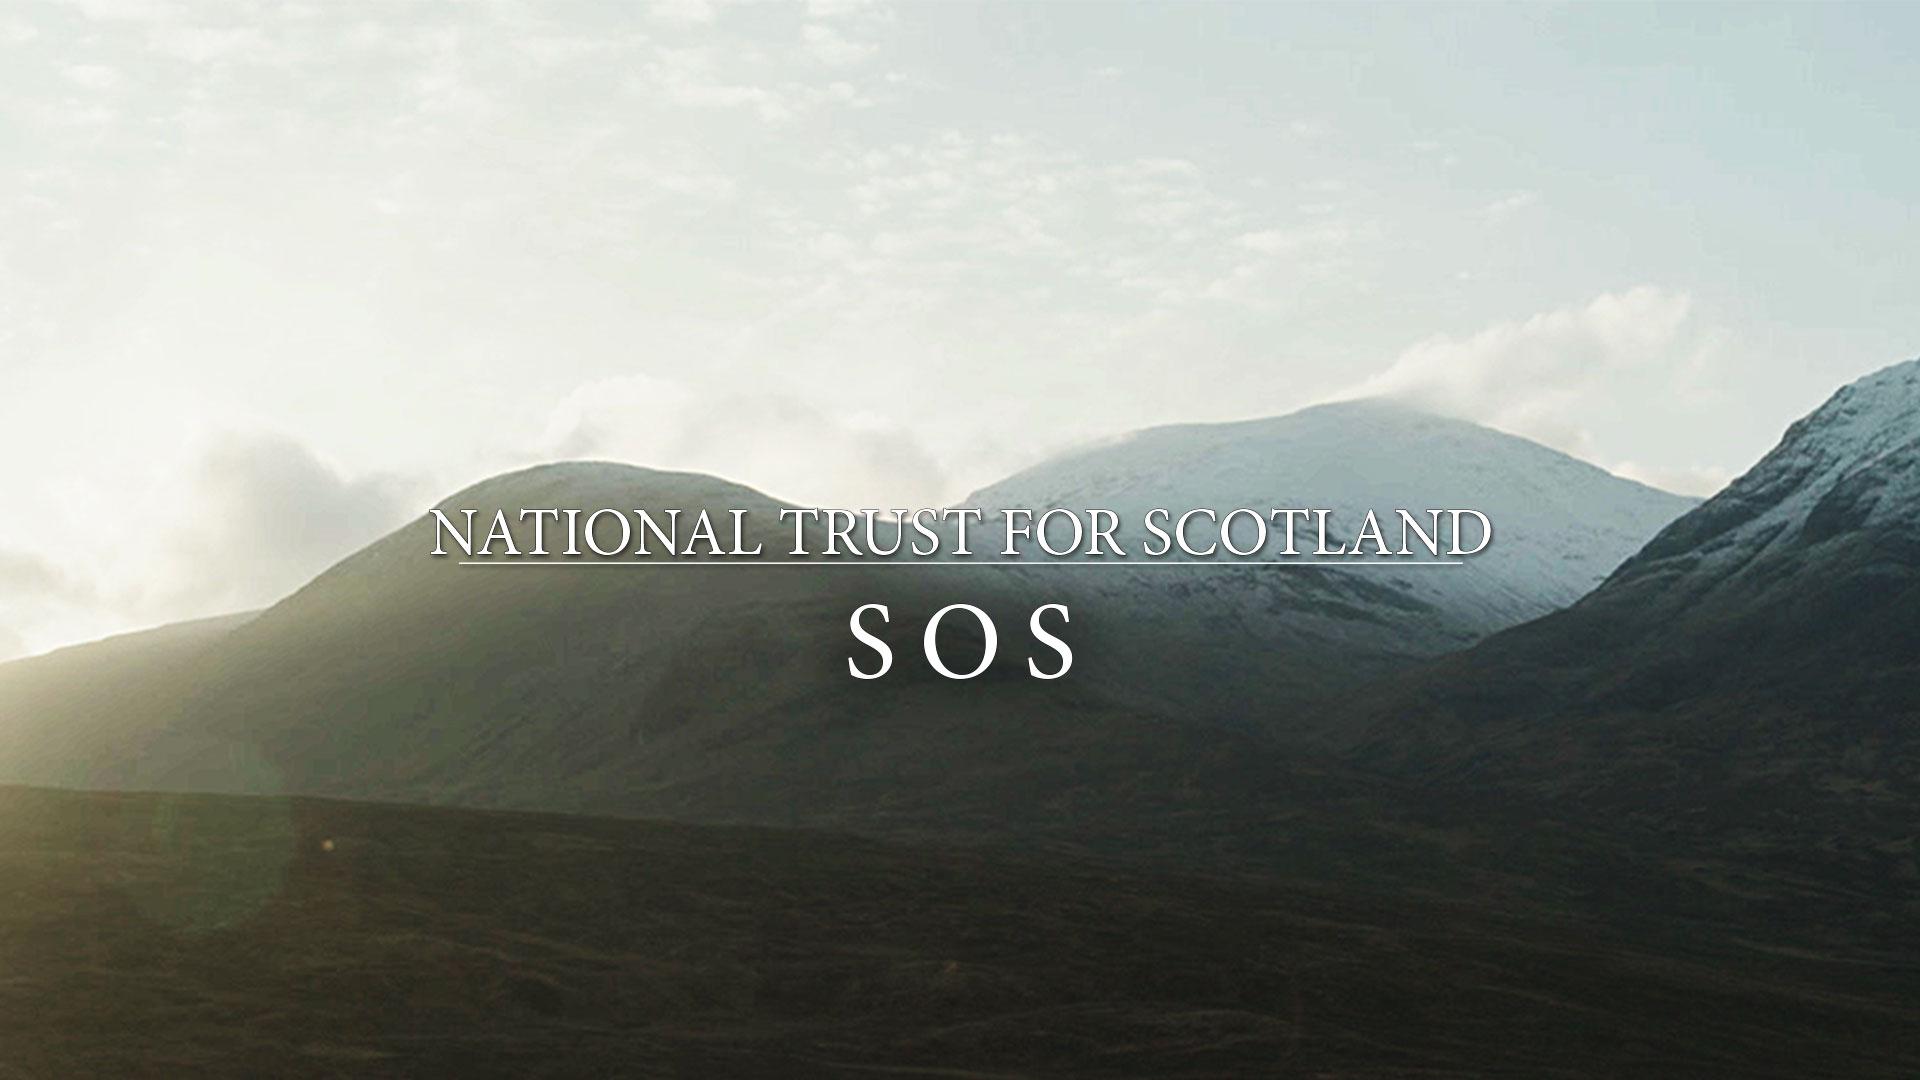 National Trust for Scotland - SOS